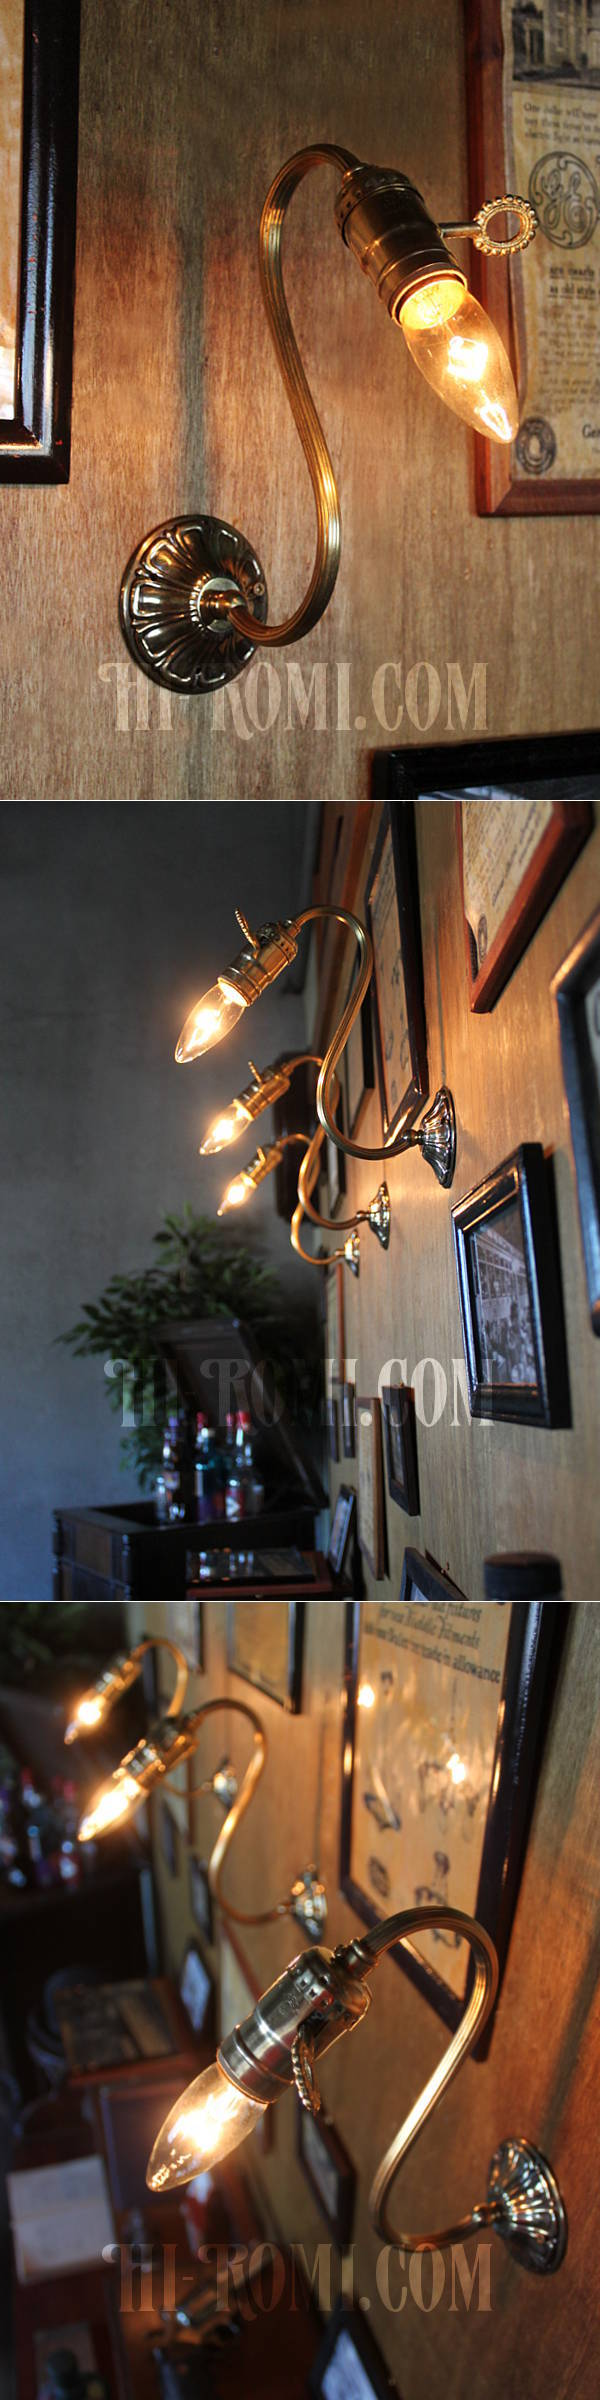 LEVITON社製真鍮ソケット付コロニアルスワンネックブラケットランプA/アメリカンヴィクトリアンランプ壁掛照明ウォールライト